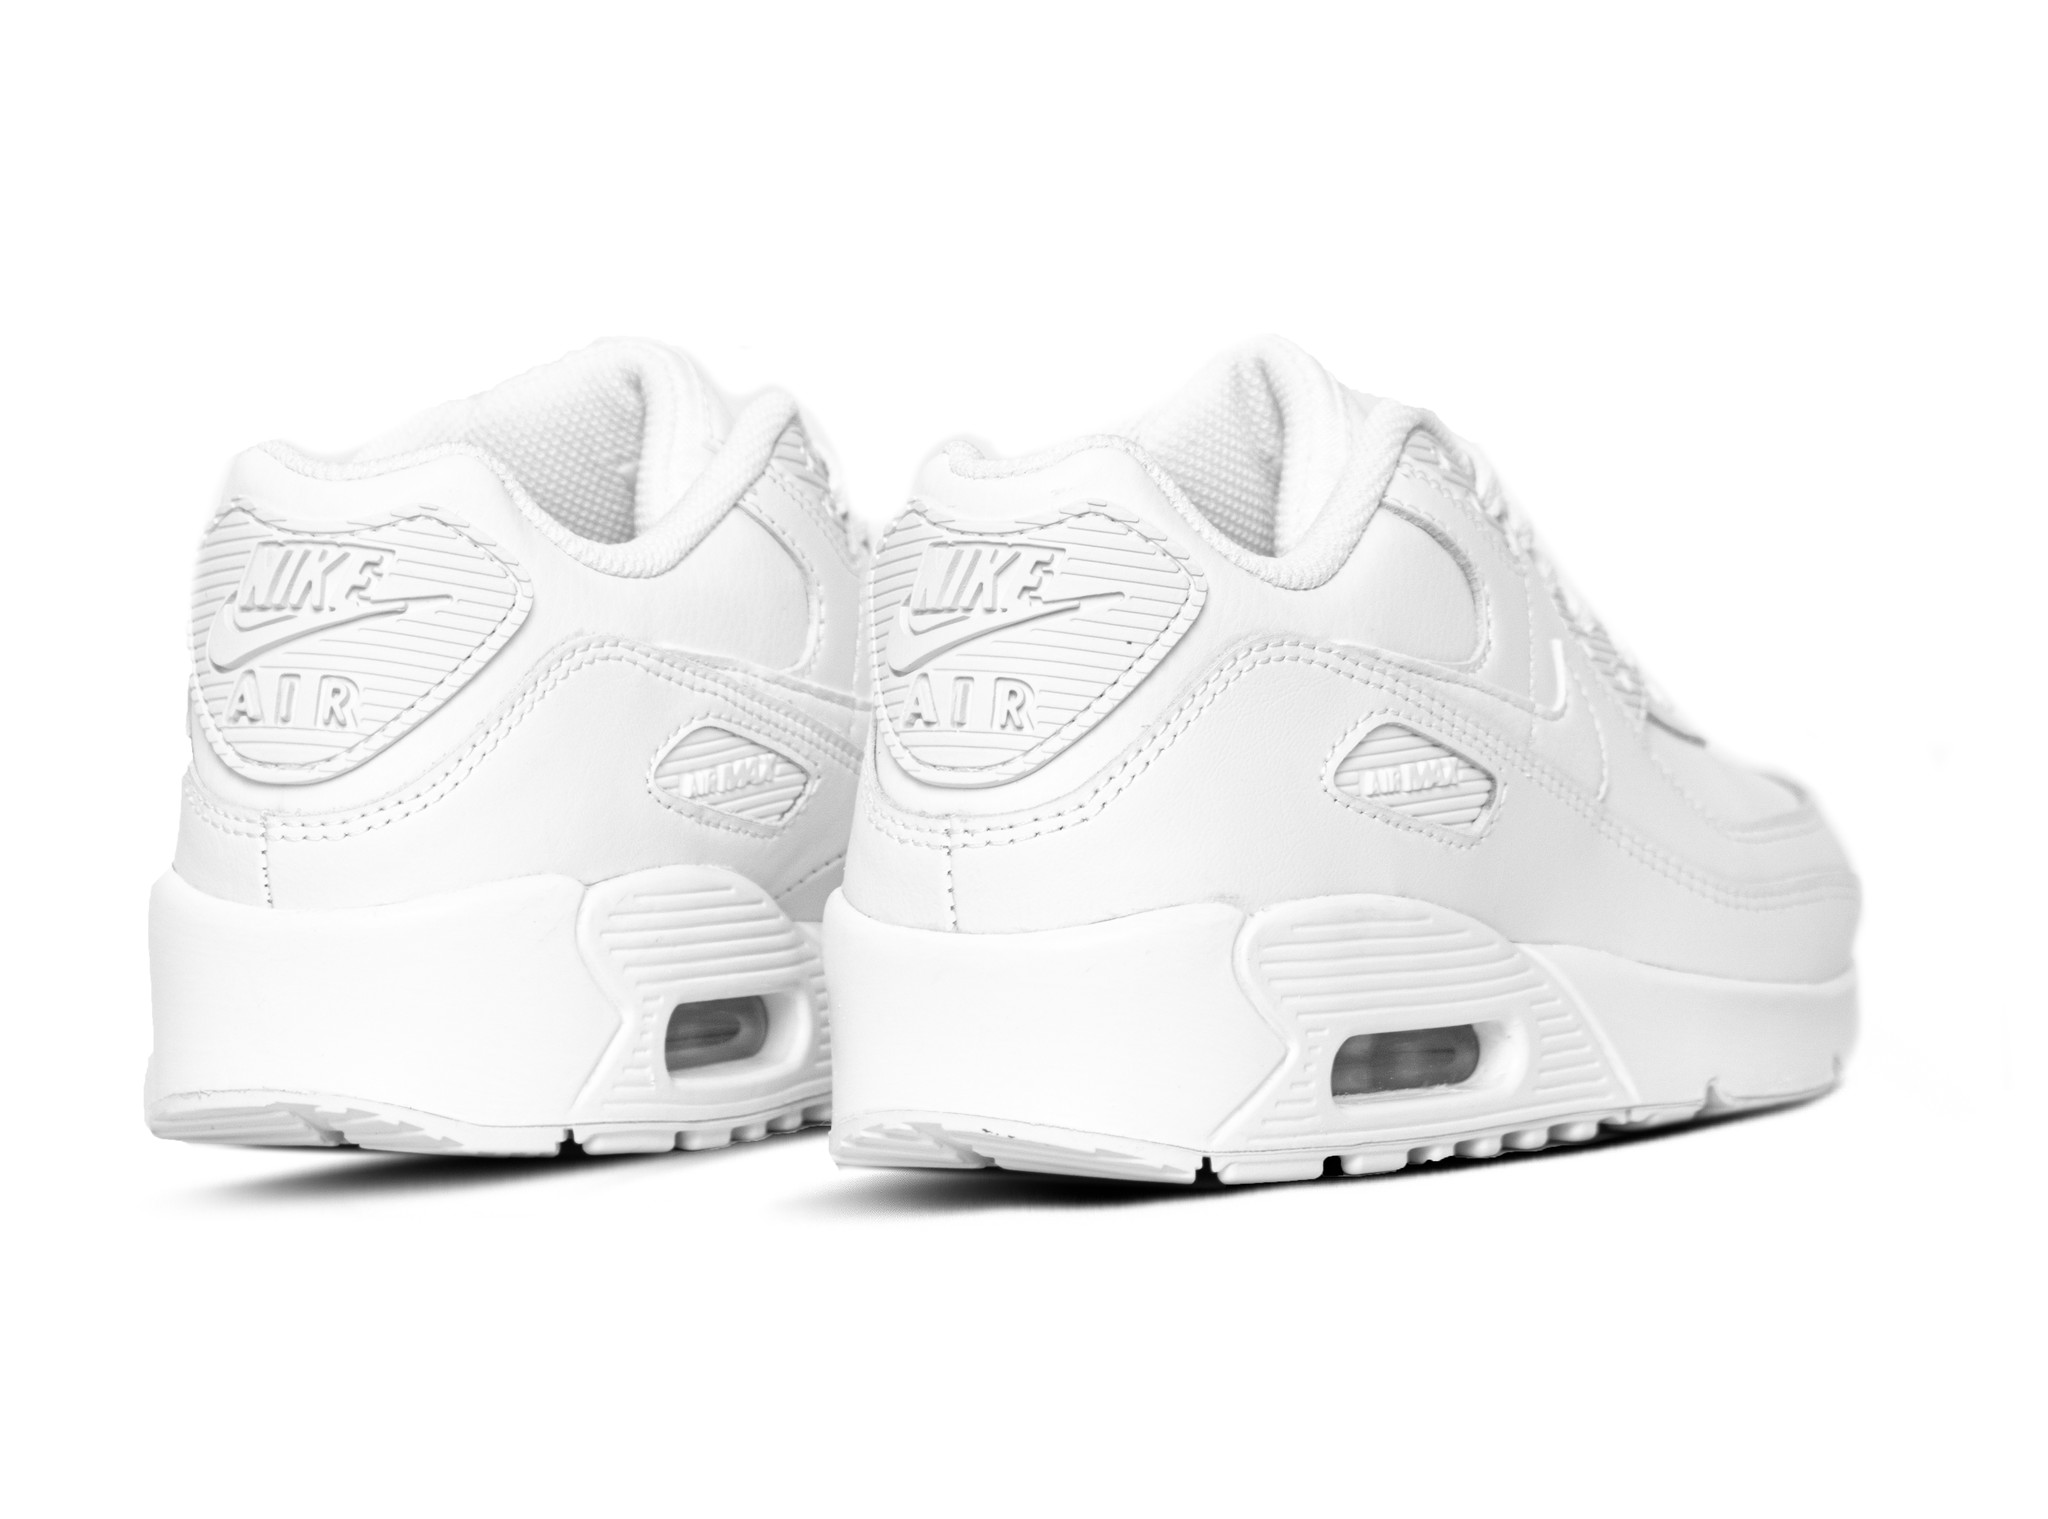 Nike Air Max 90 GS LTR White White Metallic Silver White CD6864 100